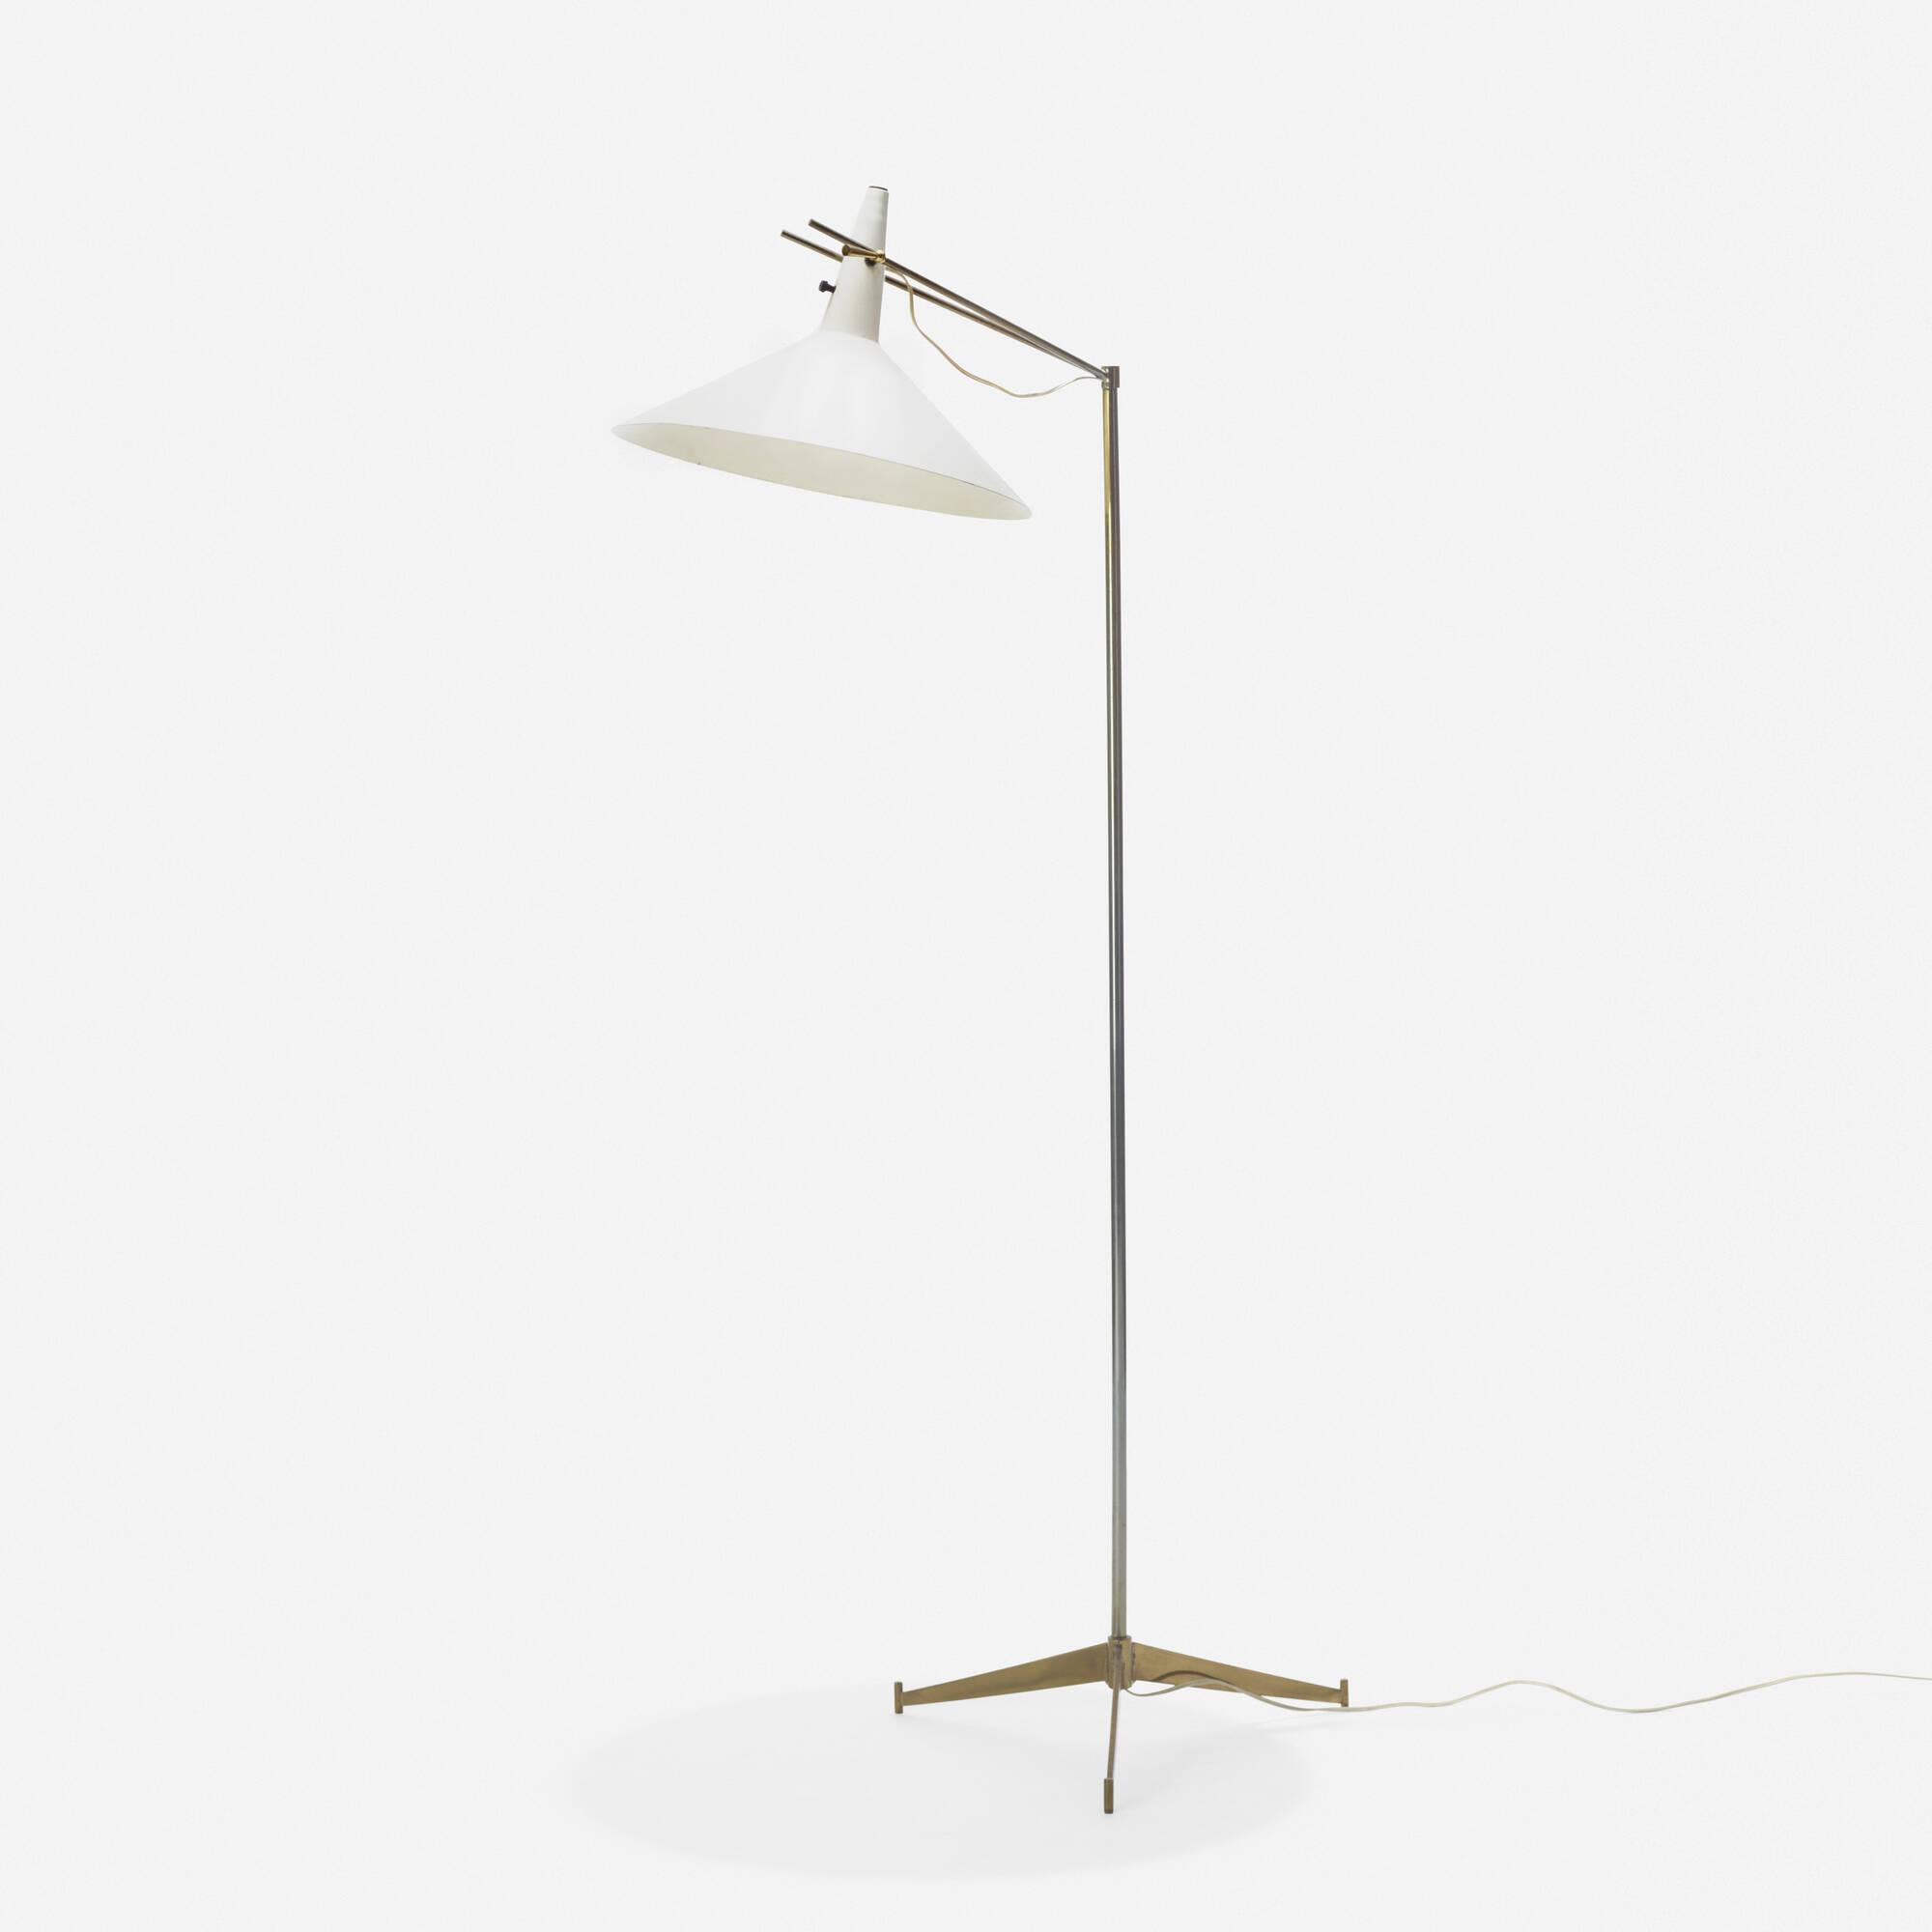 117: Paul McCobb / floor lamp (1 of 2)